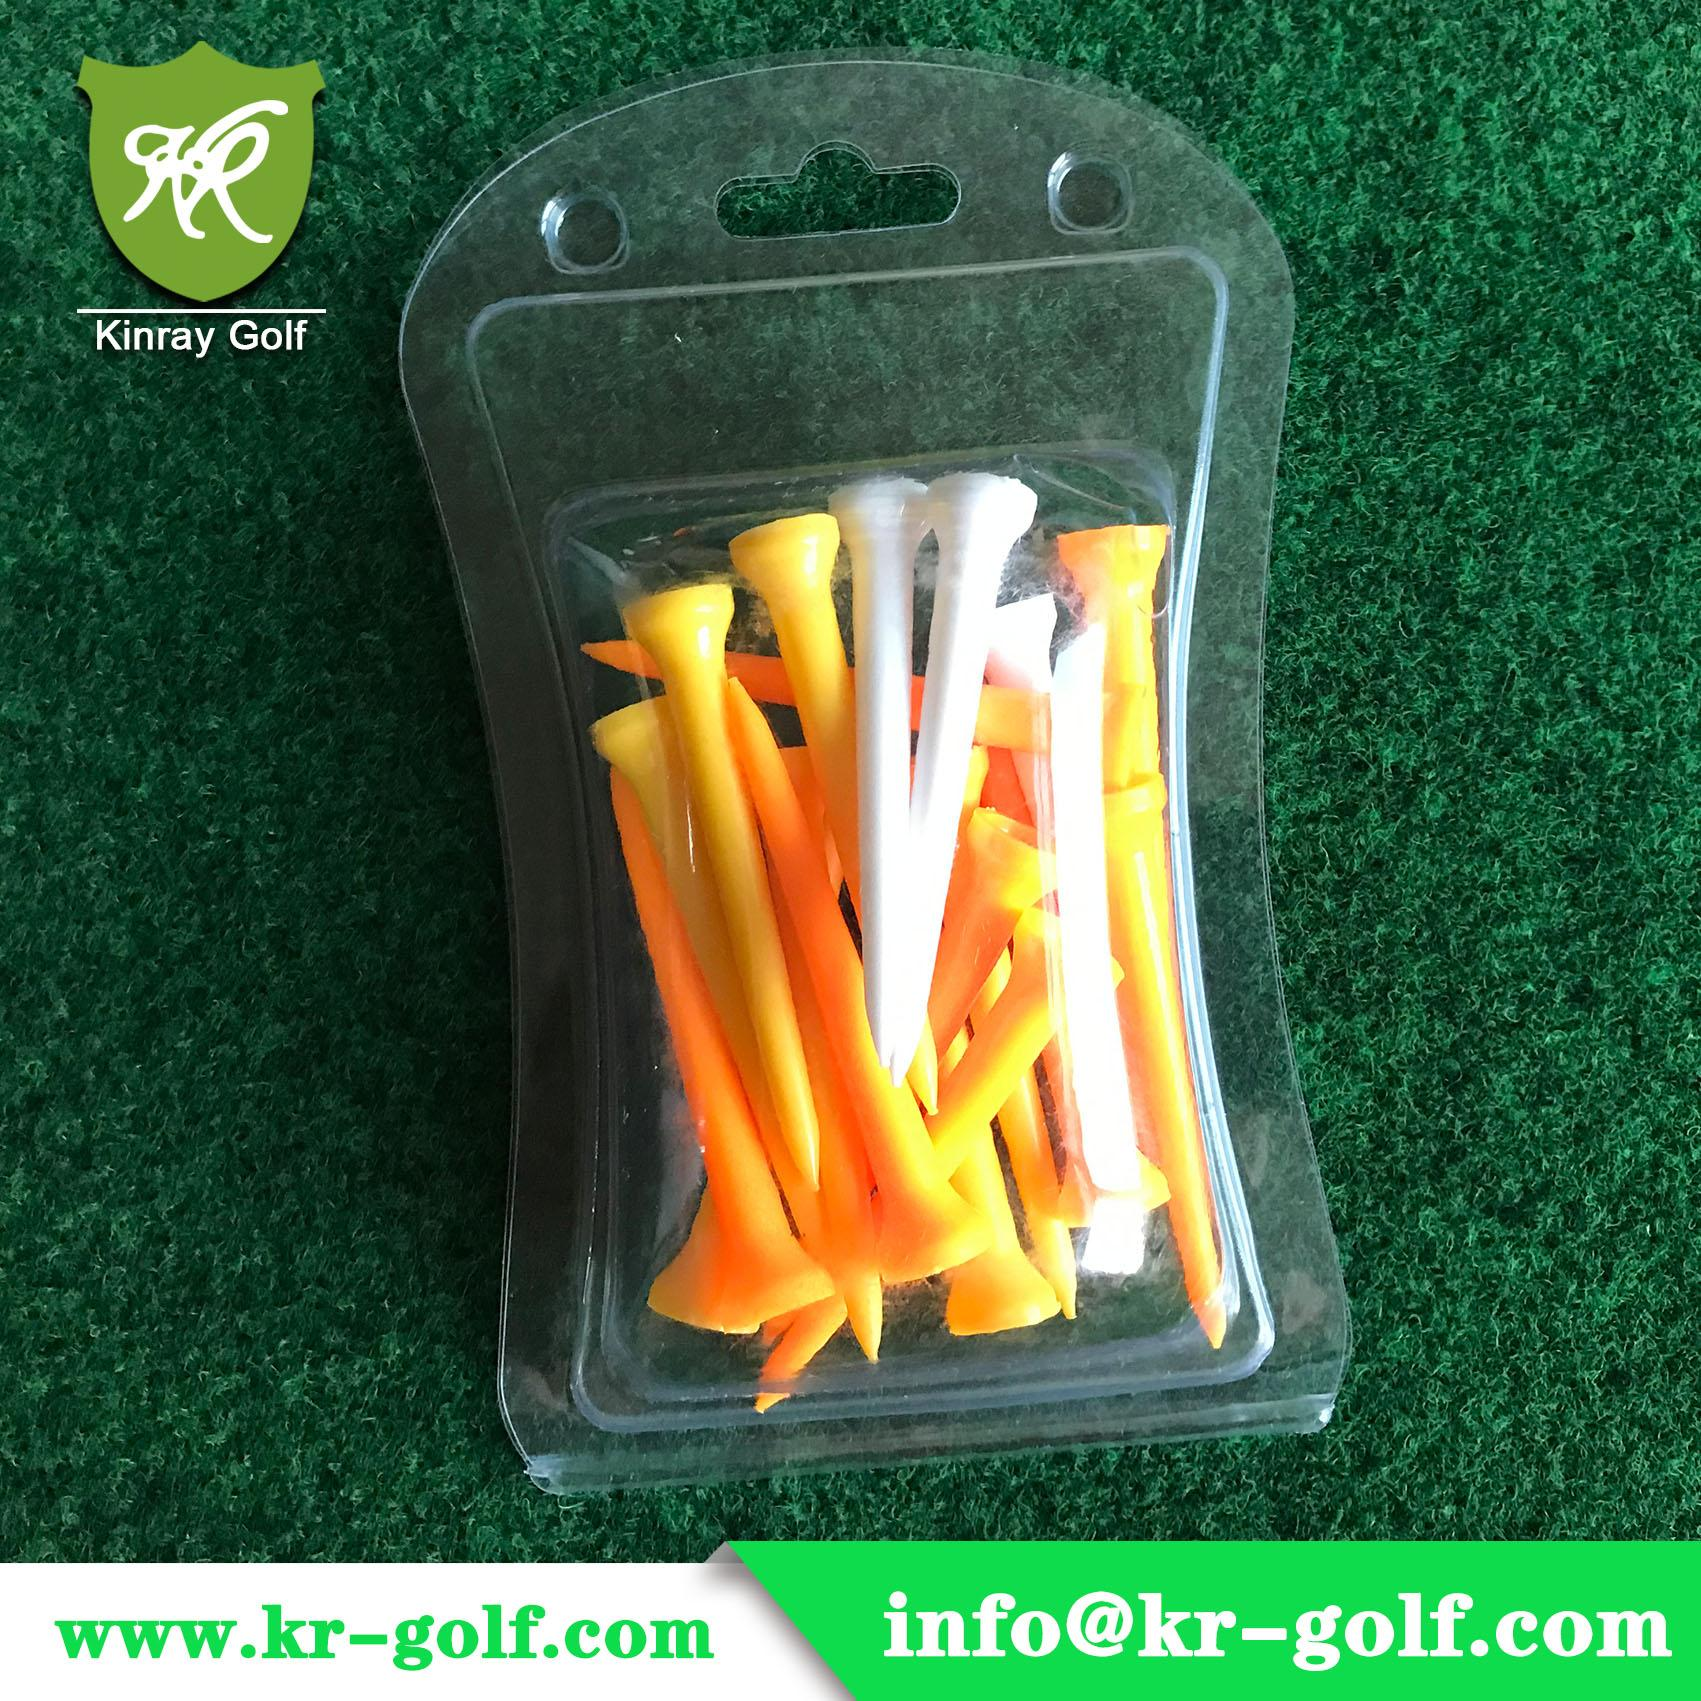 Golf  Tee  Accessories,Rubber golf tee 3